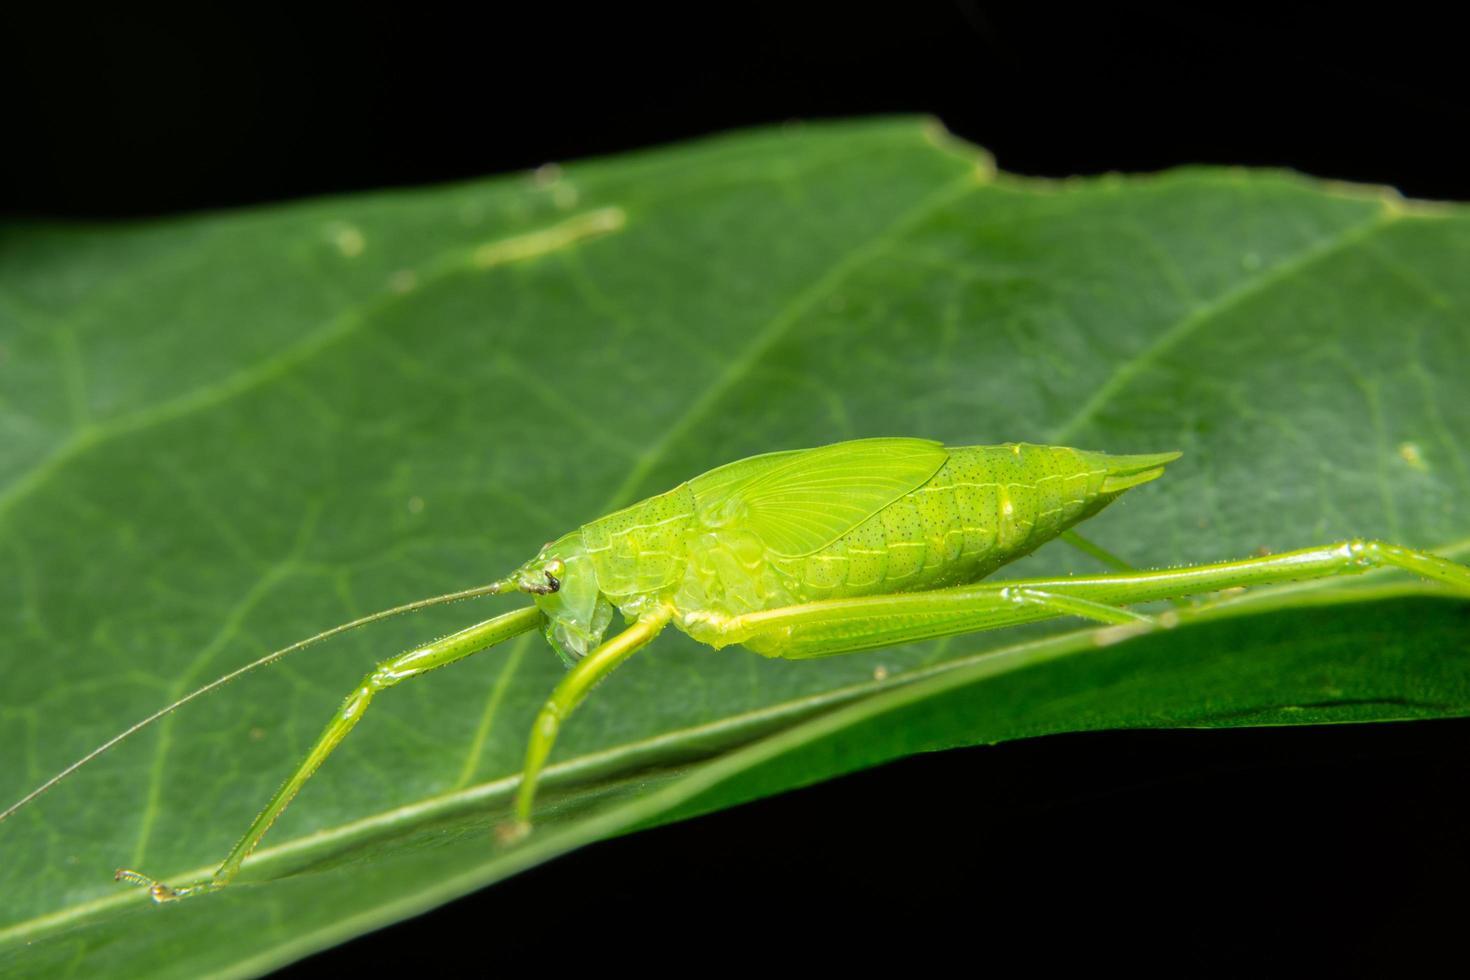 saltamontes verde en una hoja foto